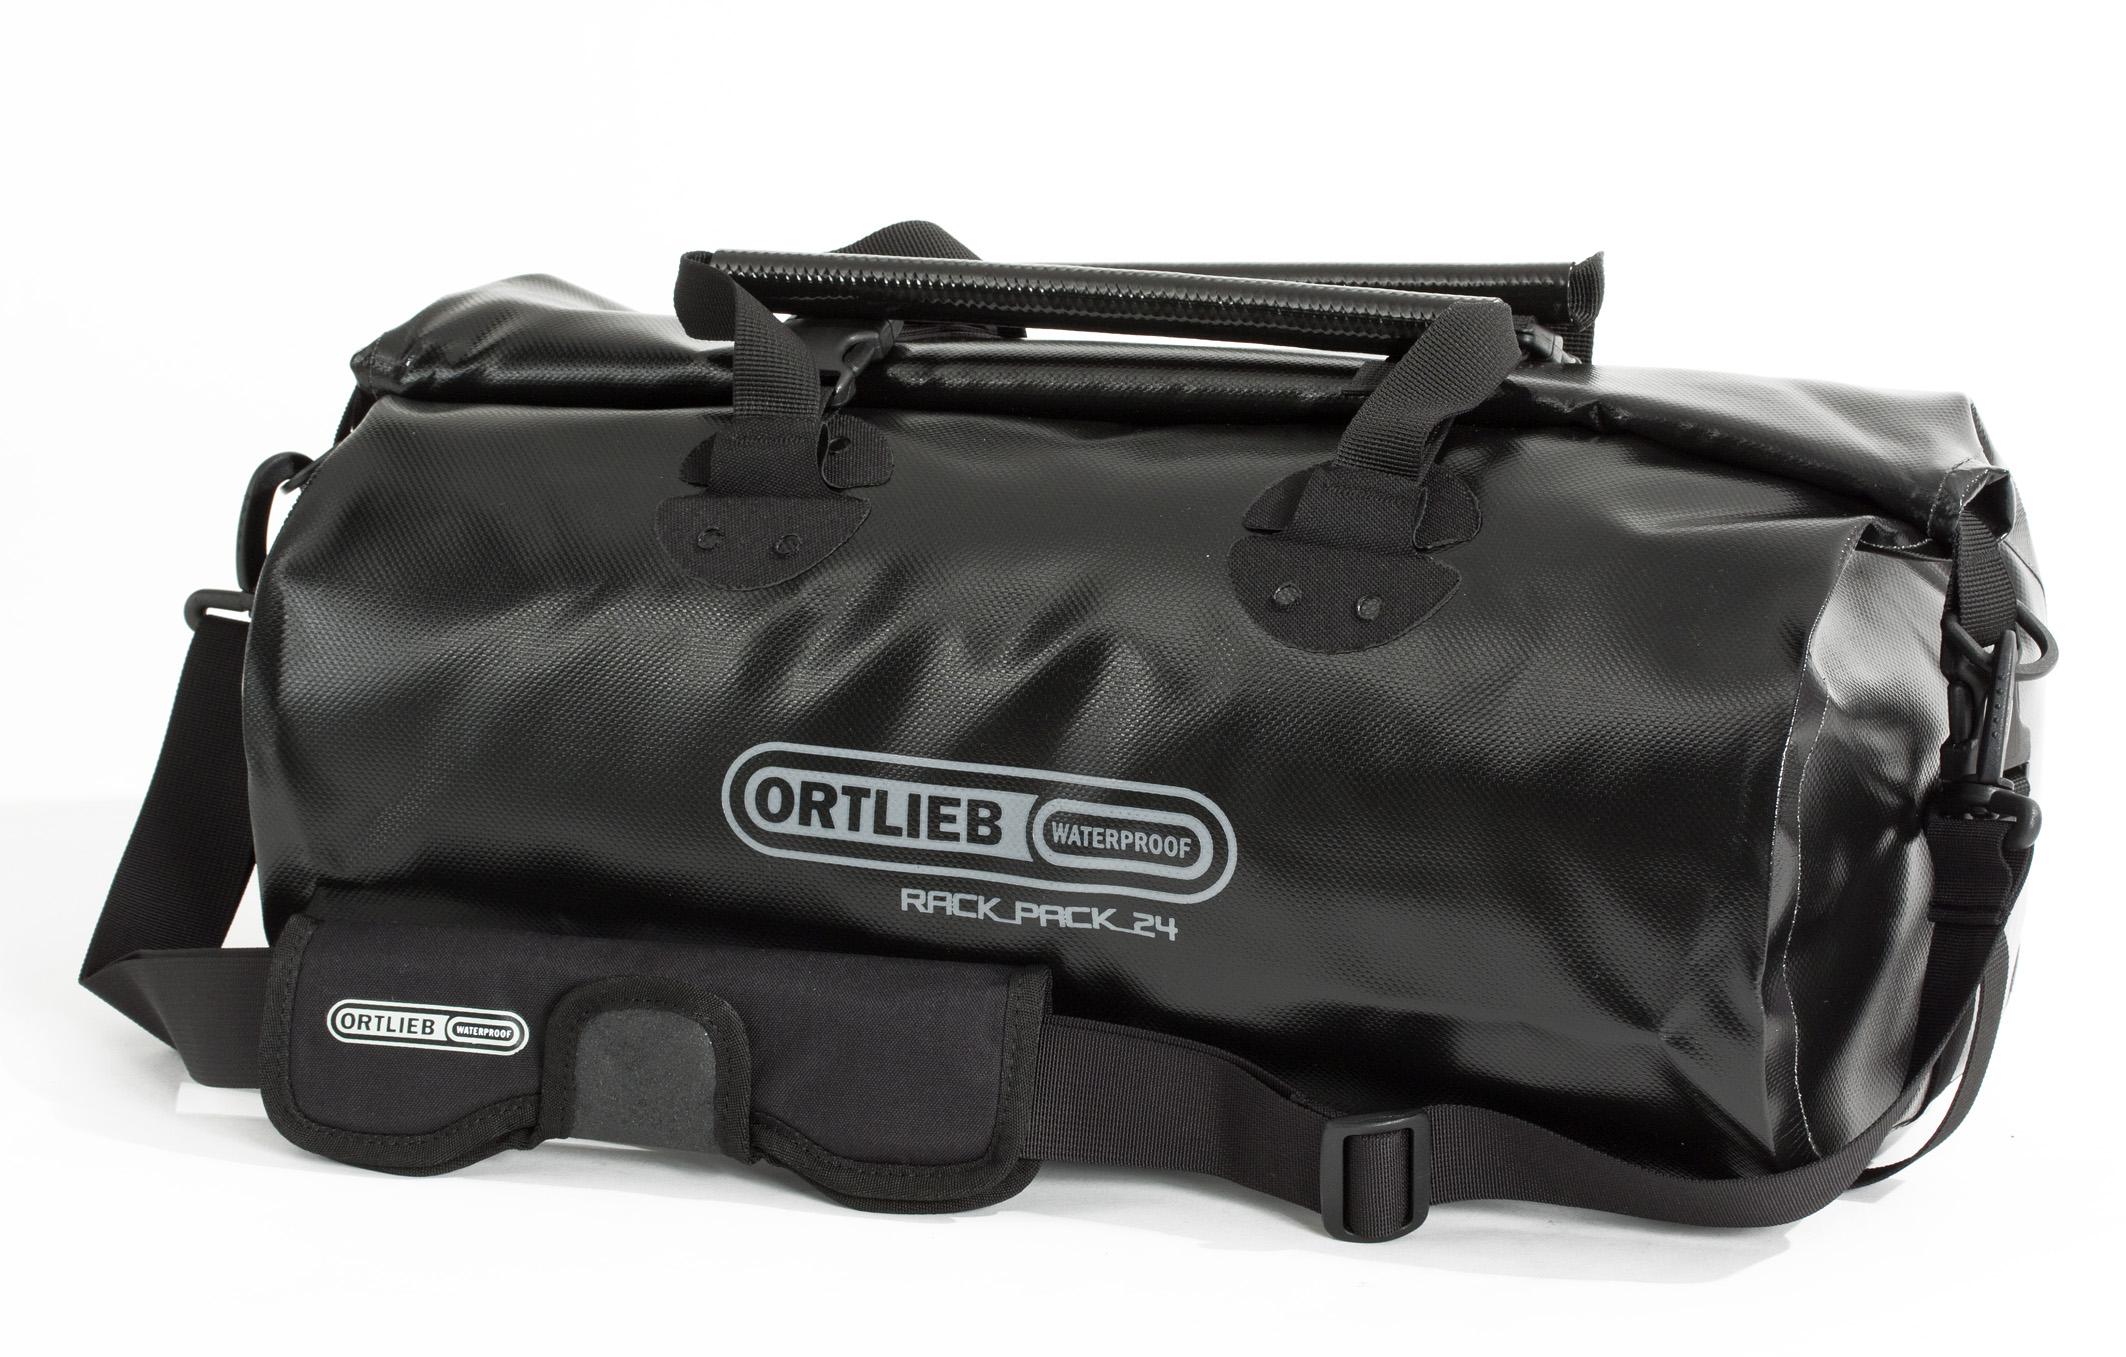 Ortlieb Rack-Pack S schwarz S